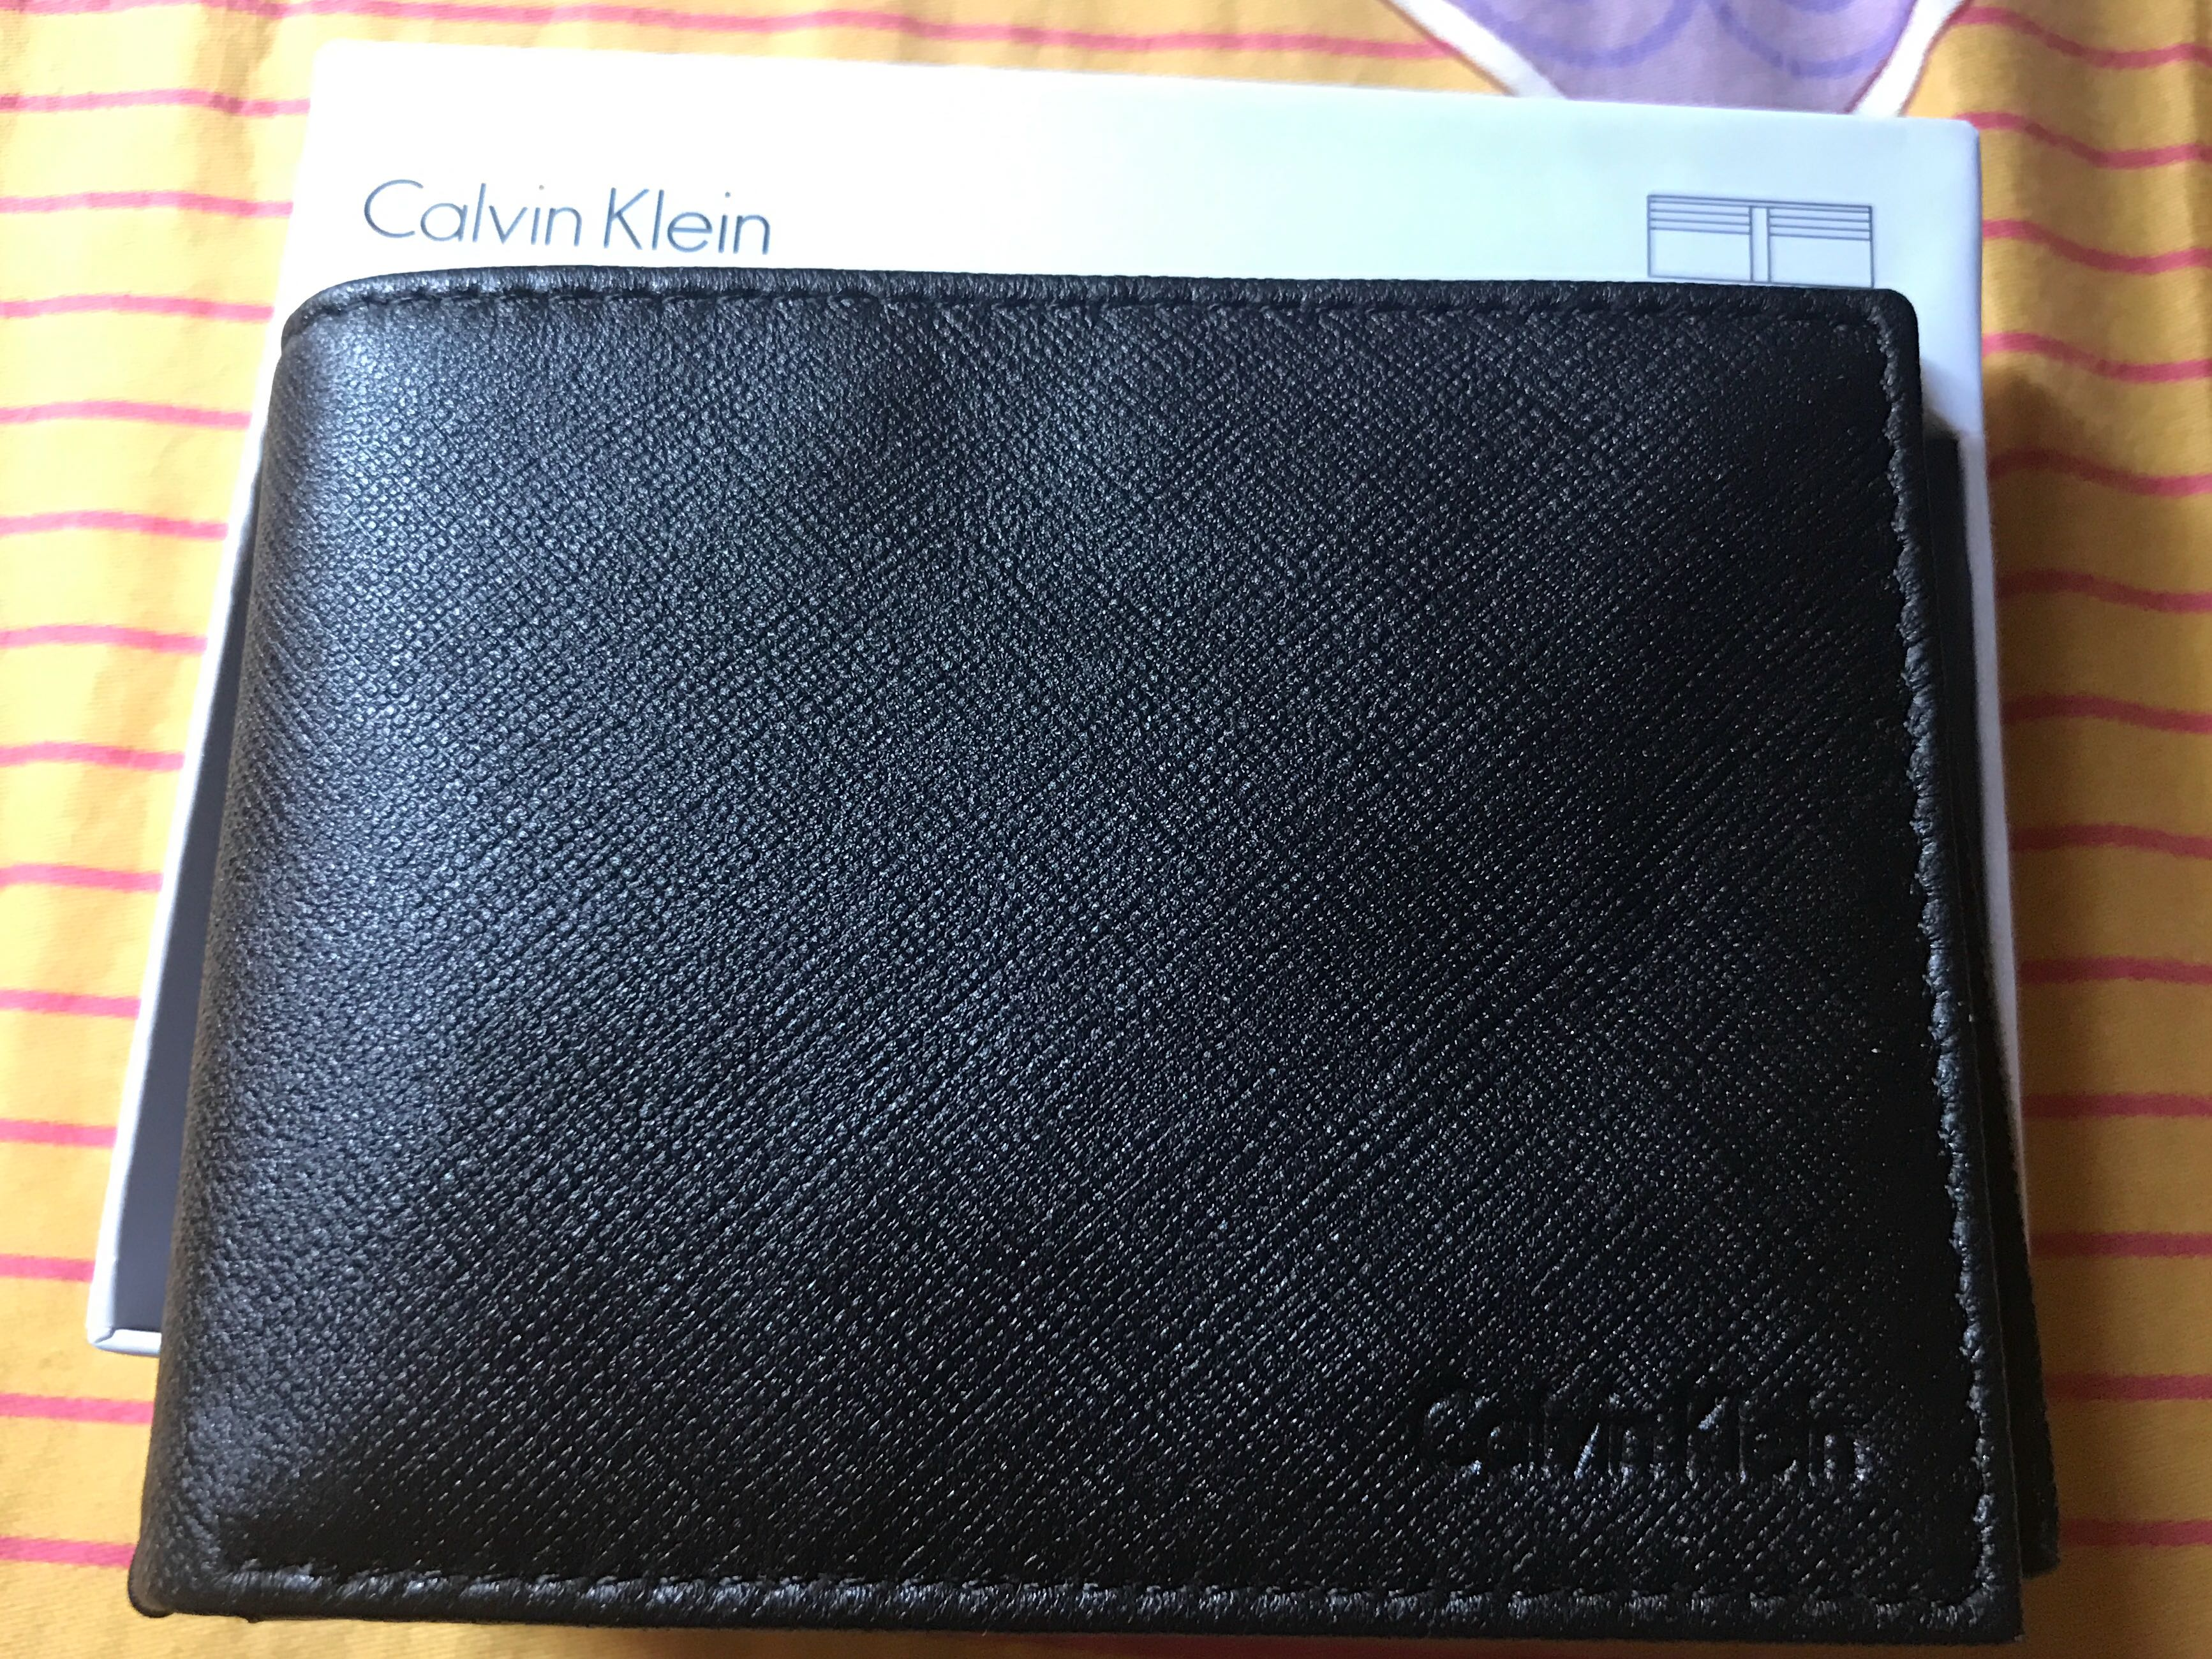 5c24df6d61881 Calvin Klein men wallet black leather, Men's Fashion, Bags & Wallets,  Wallets on Carousell